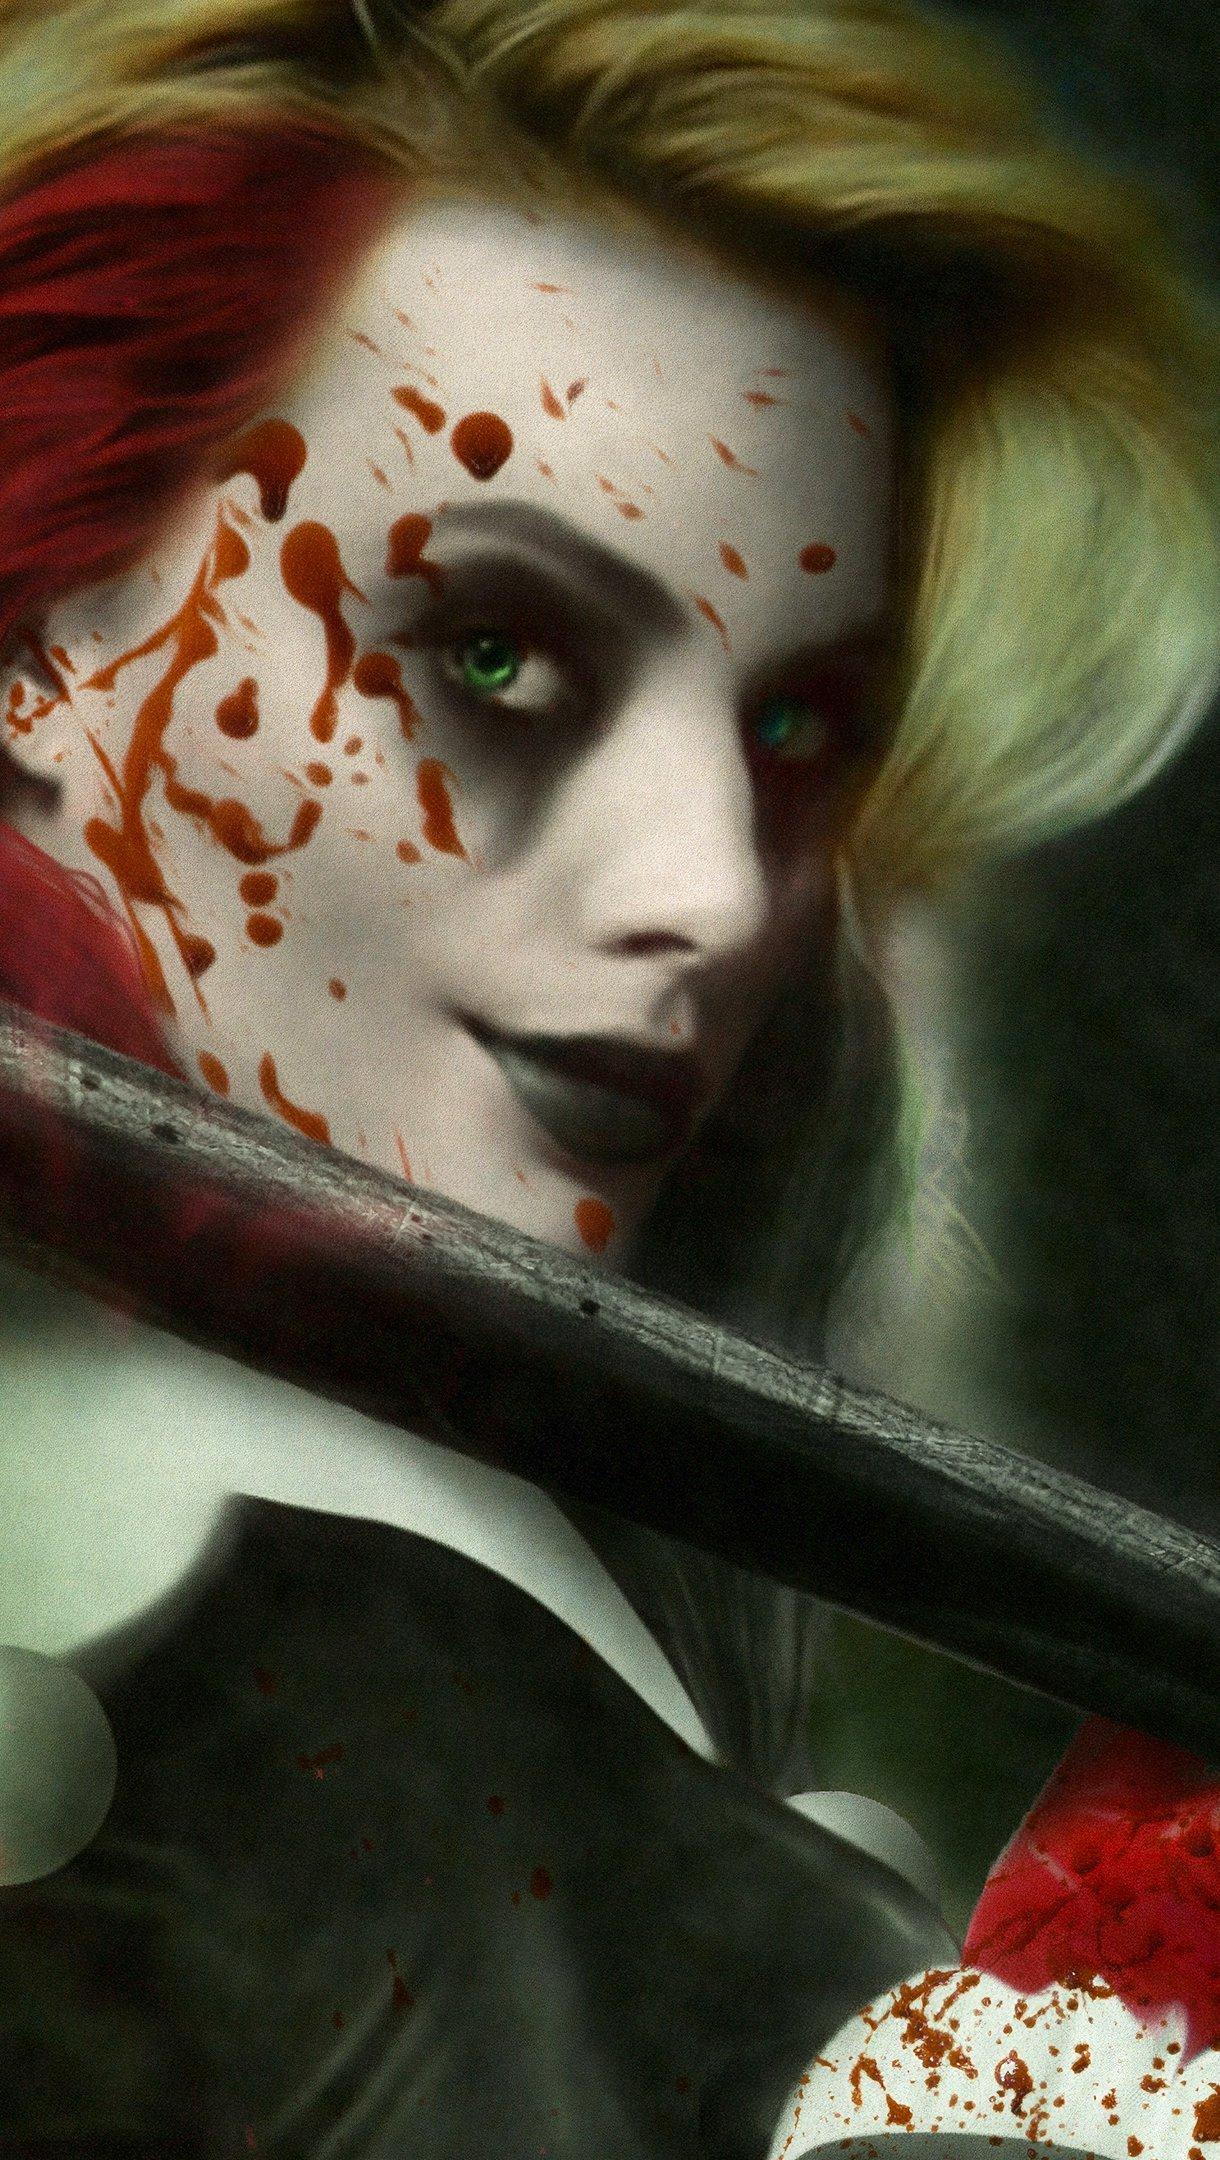 Wallpaper Harley Quinn The bkiid Queen Vertical